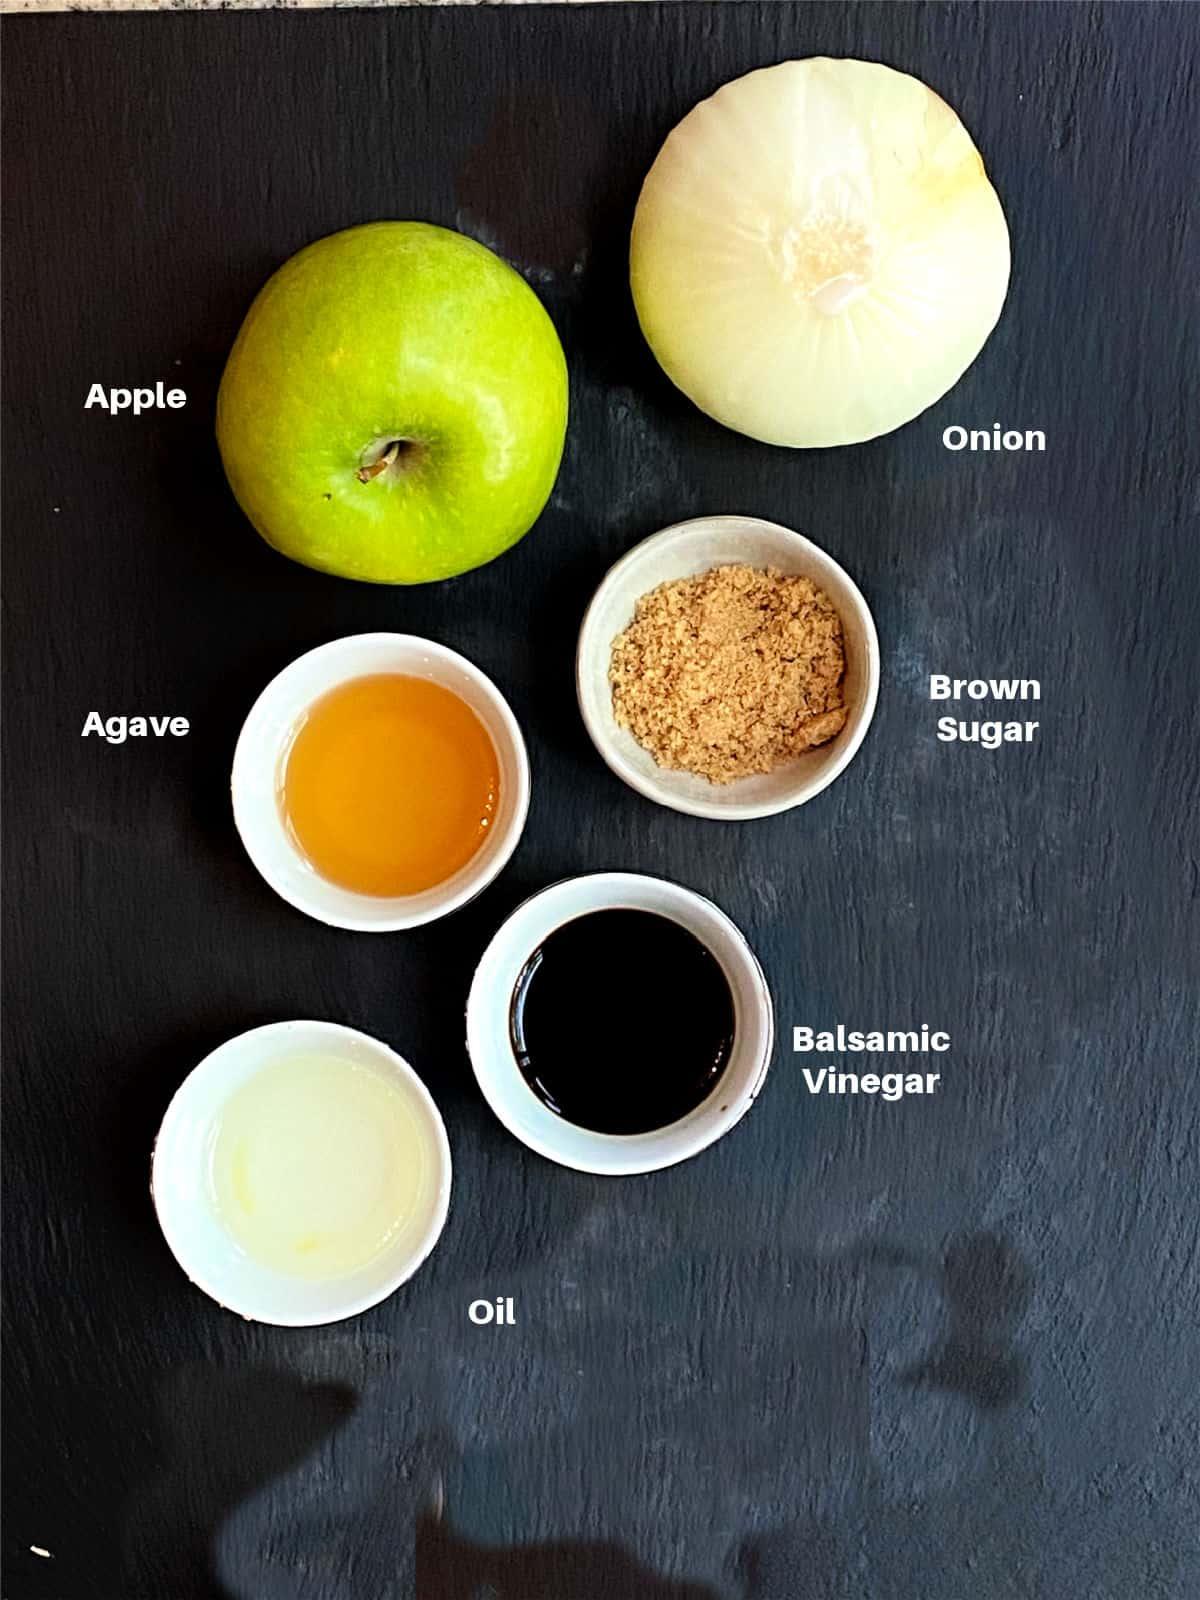 ingredients for apple chutney.  Apples, onion, agar, brown sugar, balsamic vinegar and oil